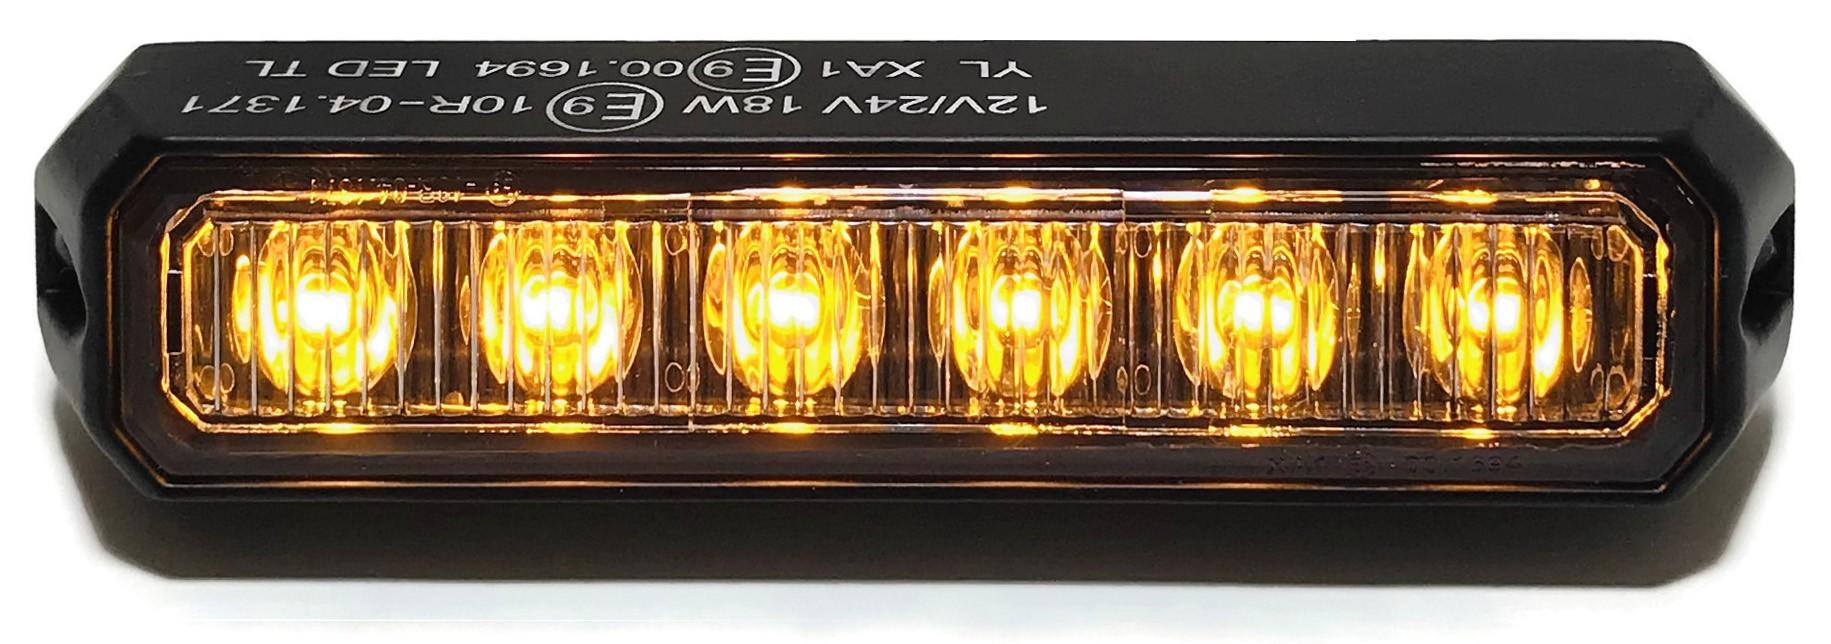 LAMPA OSTRZEGAWCZA 6 LED STROBOSKOP AUTOLAWETA TIR